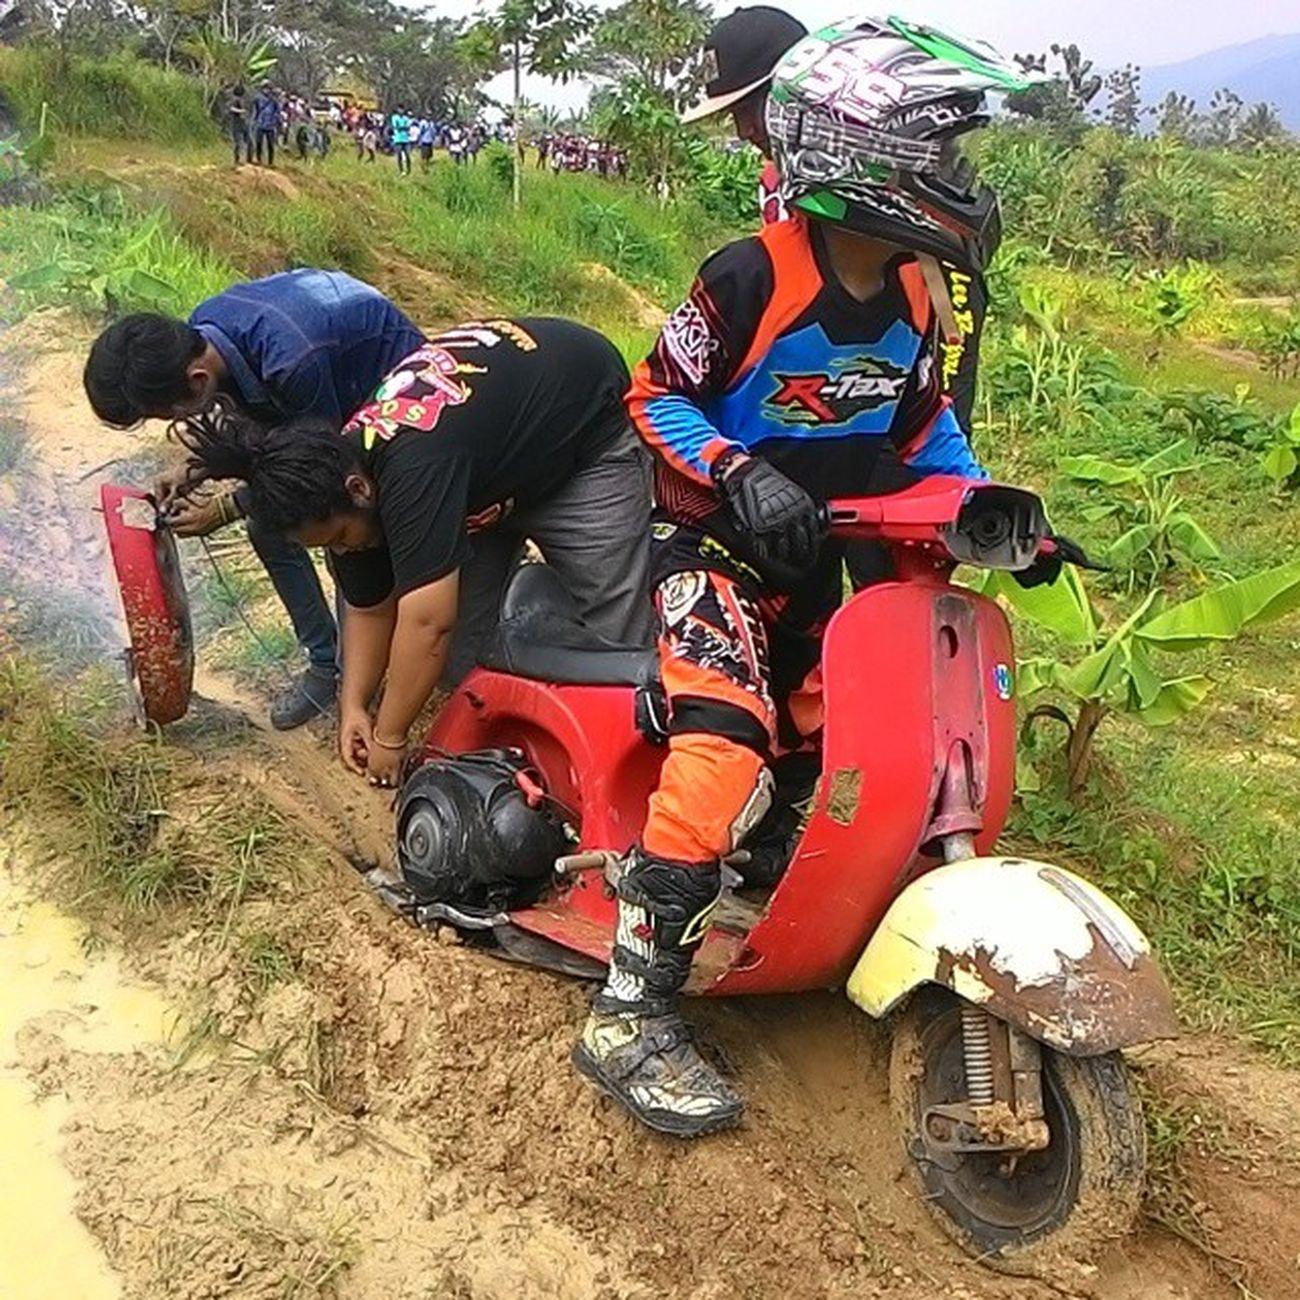 GTX Vespa Banjarsari Vespacross Vesparacing Gtx Sober  Saku Vespagram Scooterprix Scooterracing